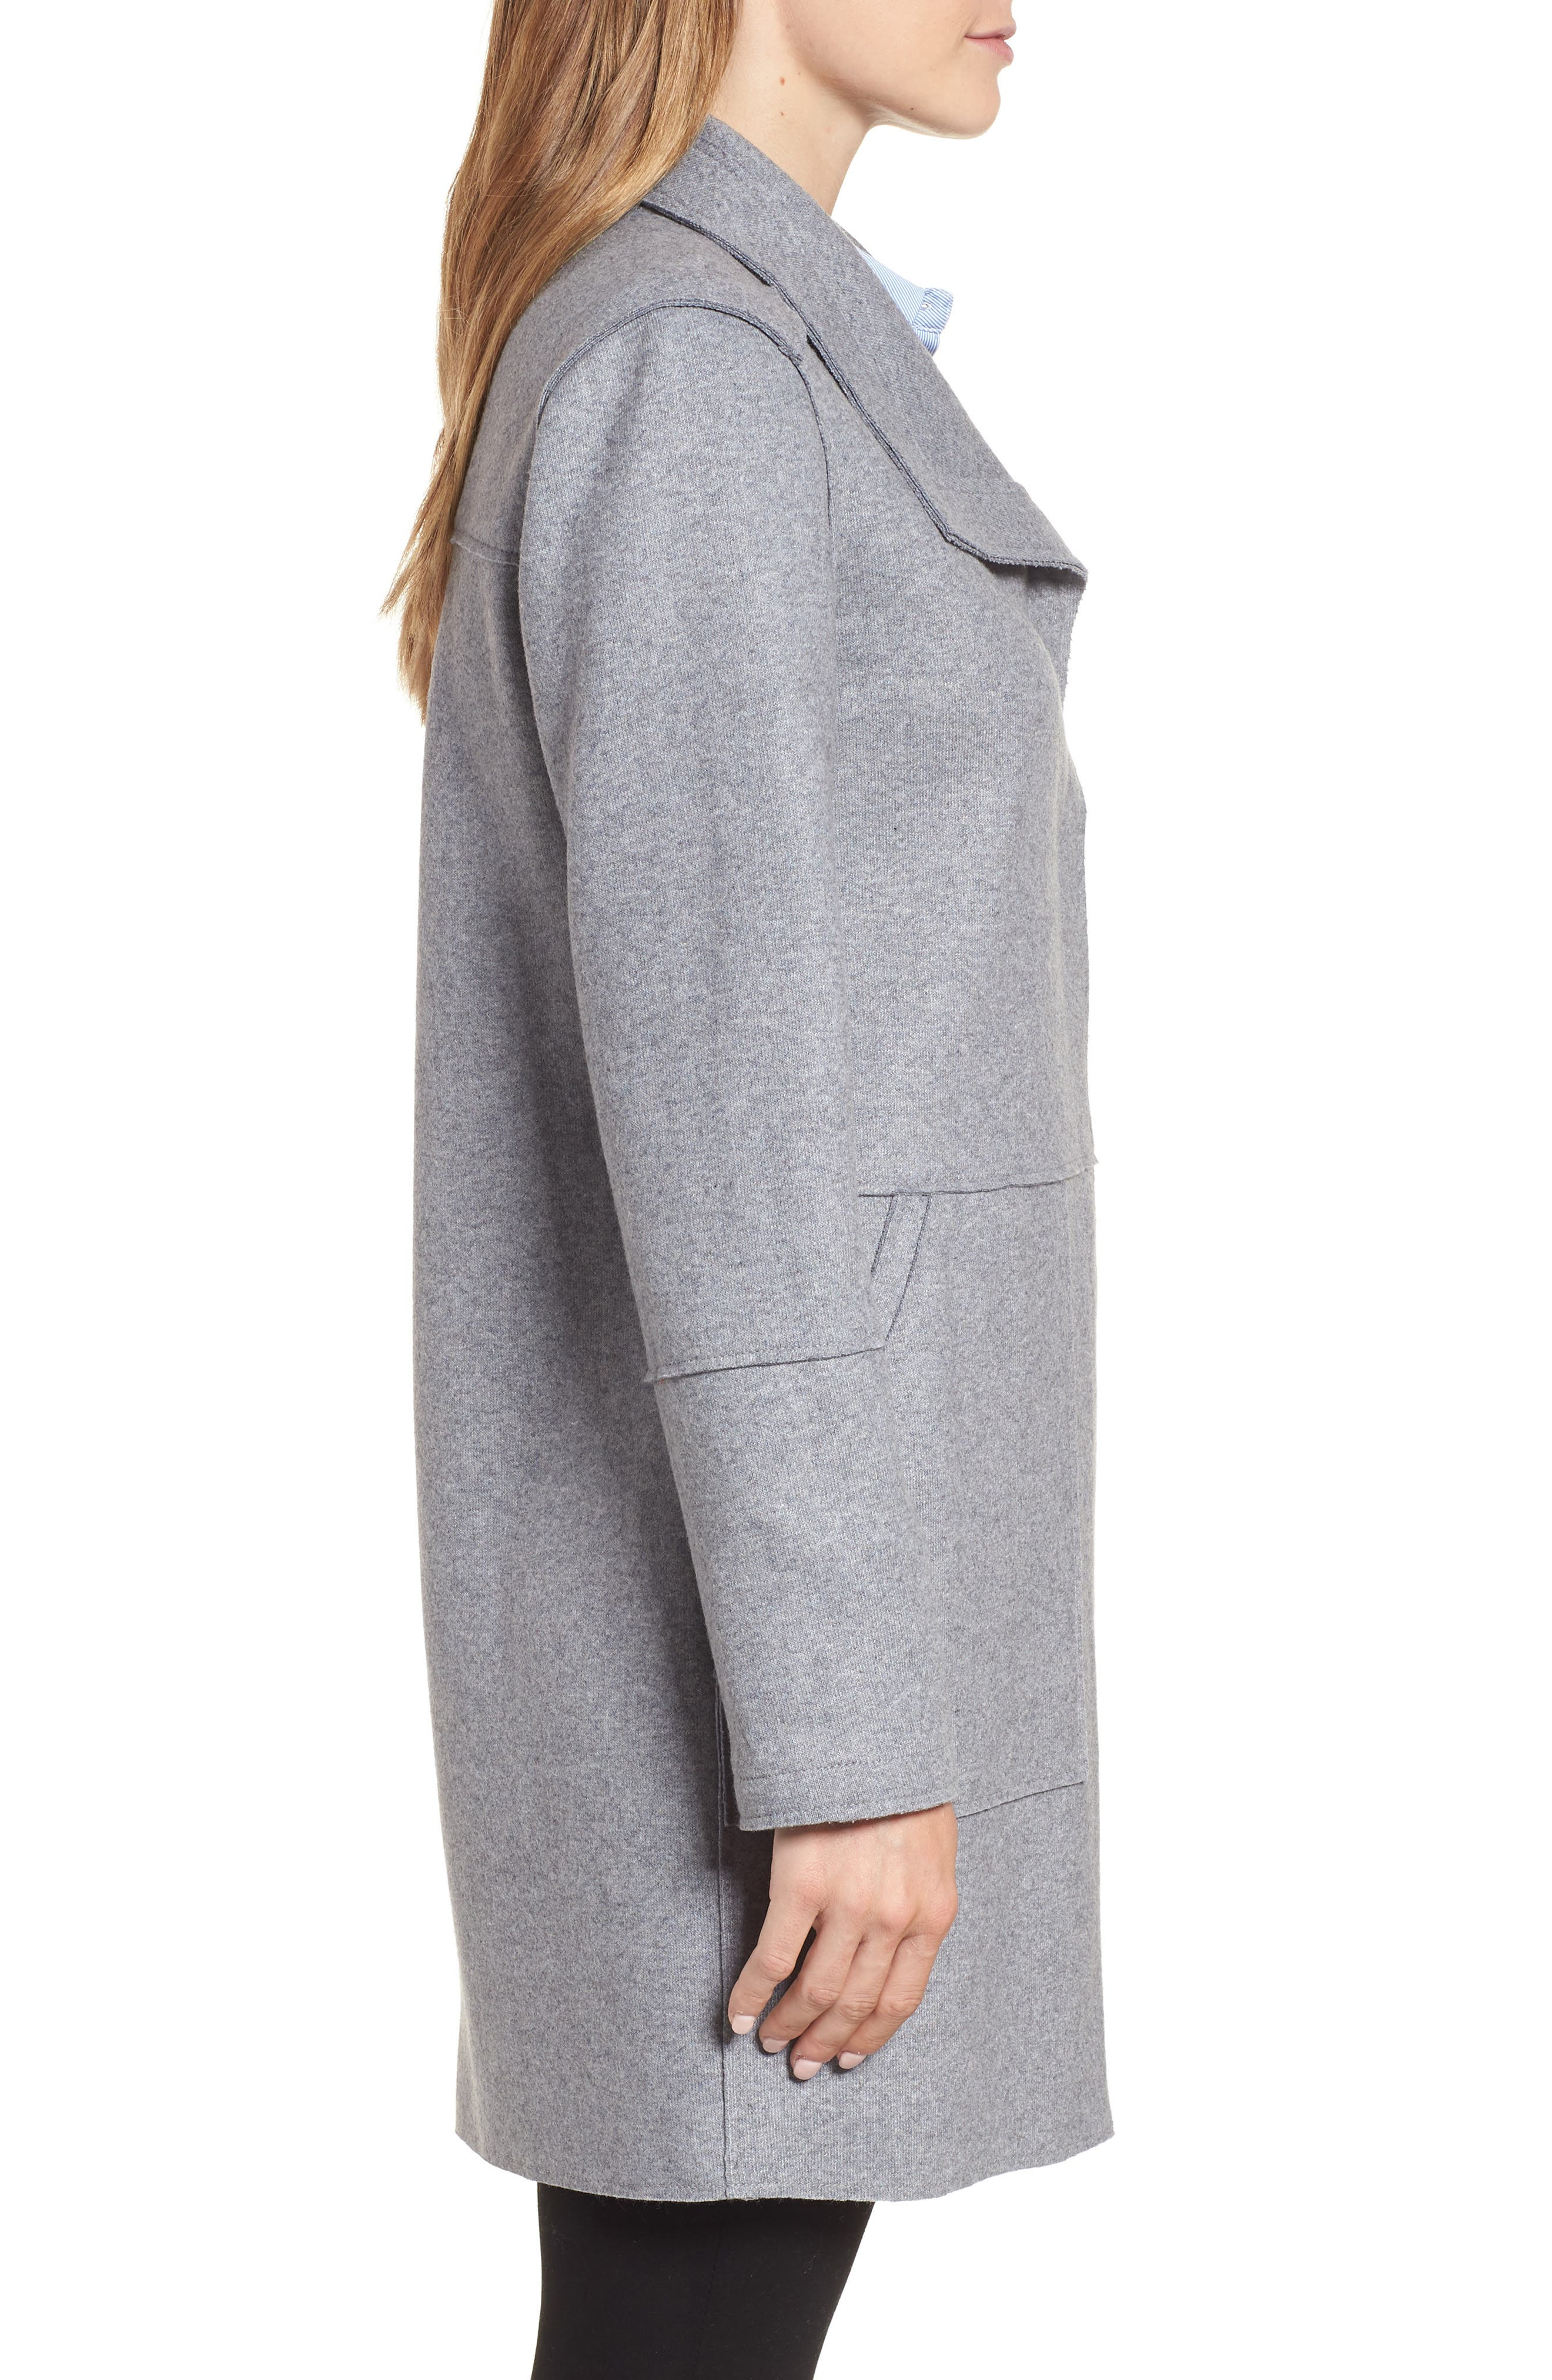 KENNETH COLE NEW YORK,                             Envelope Collar Wool Blend Knit Coat,                             Alternate thumbnail 4, color,                             033